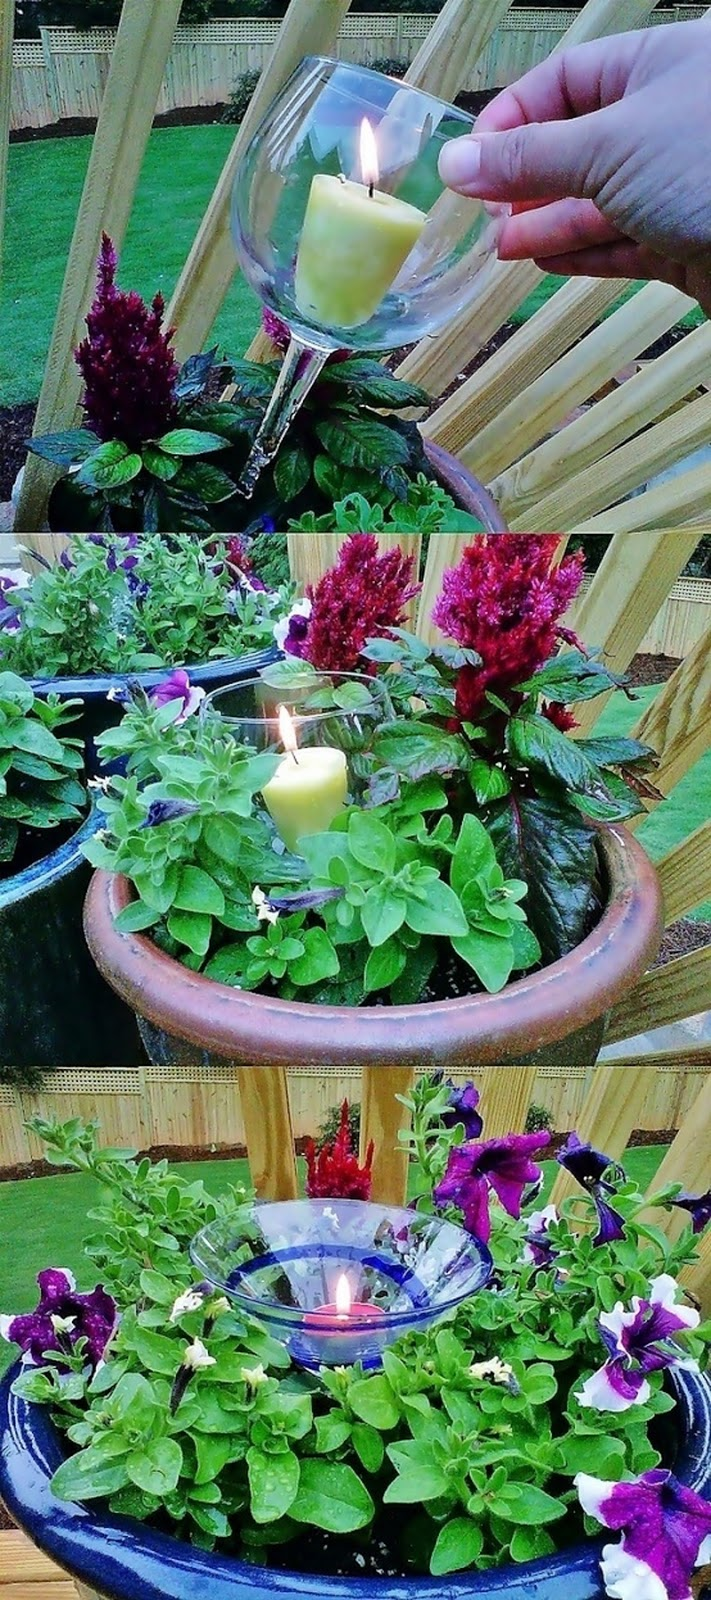 Creative diy gardening ideas with recycled items for Garden idea diy